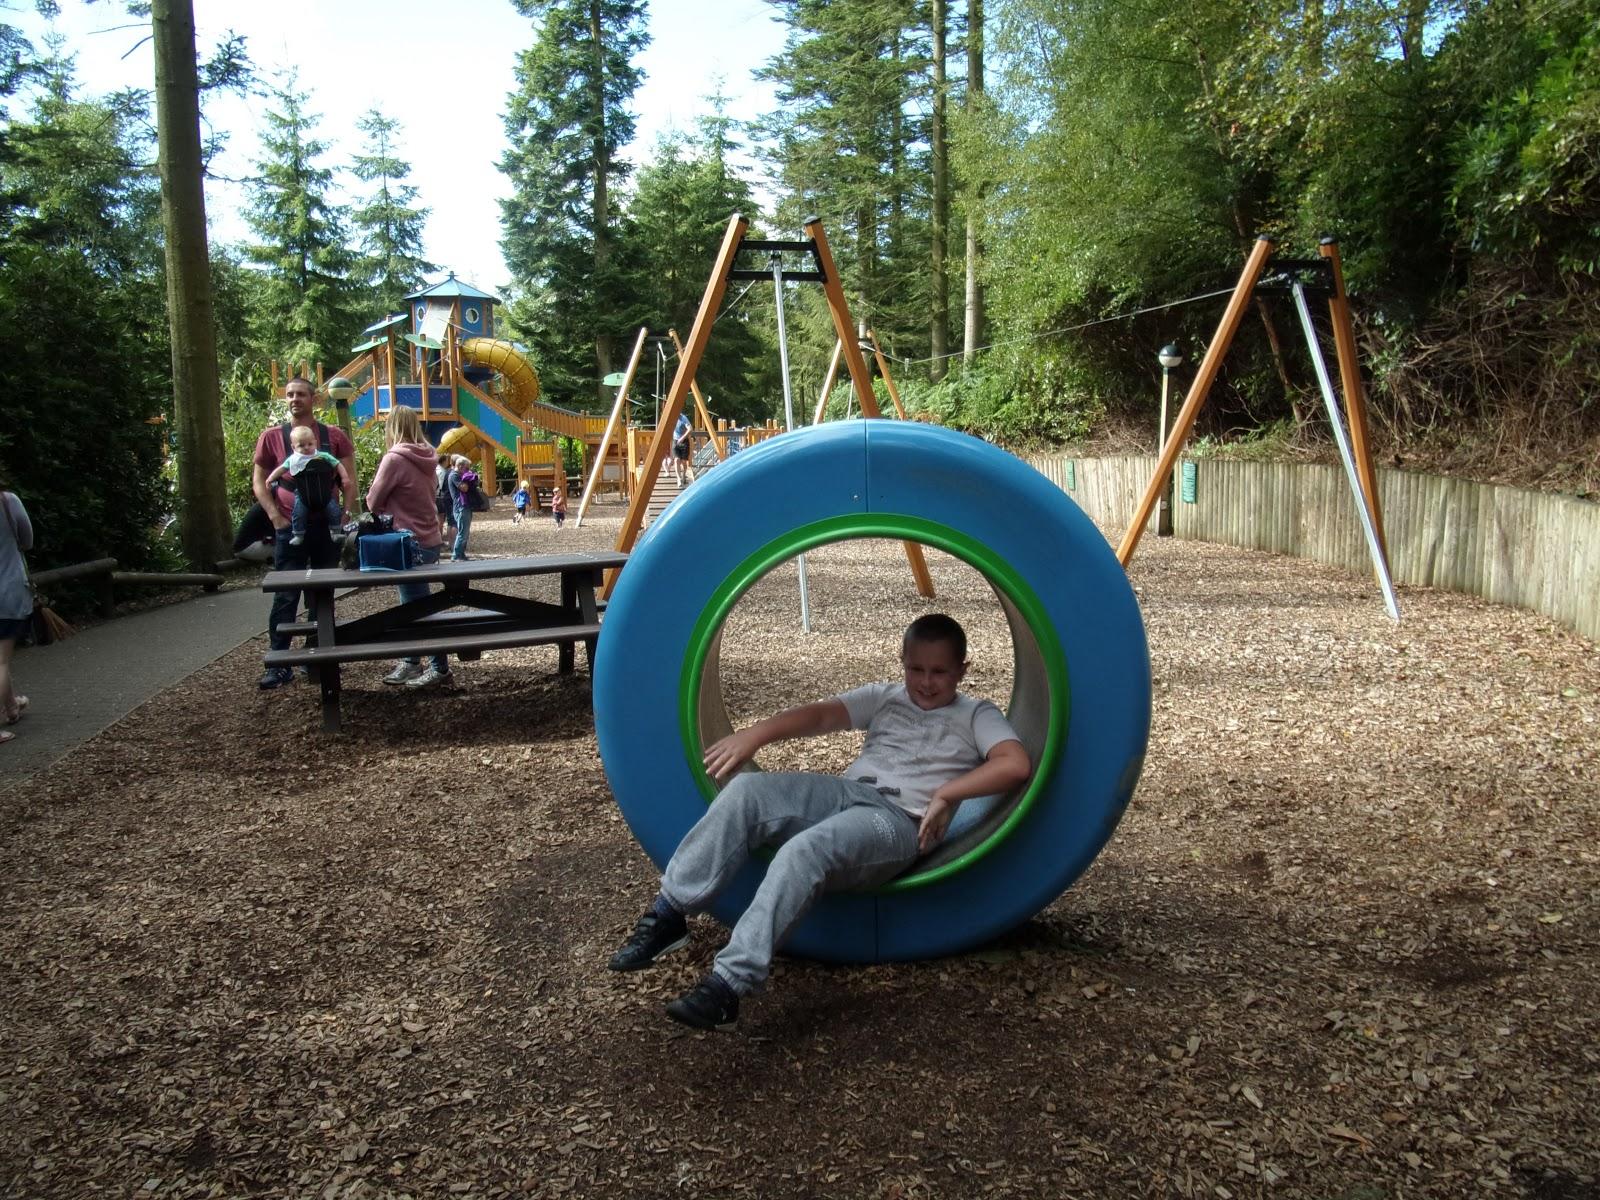 outdoor adventure playground centre parcs longleat